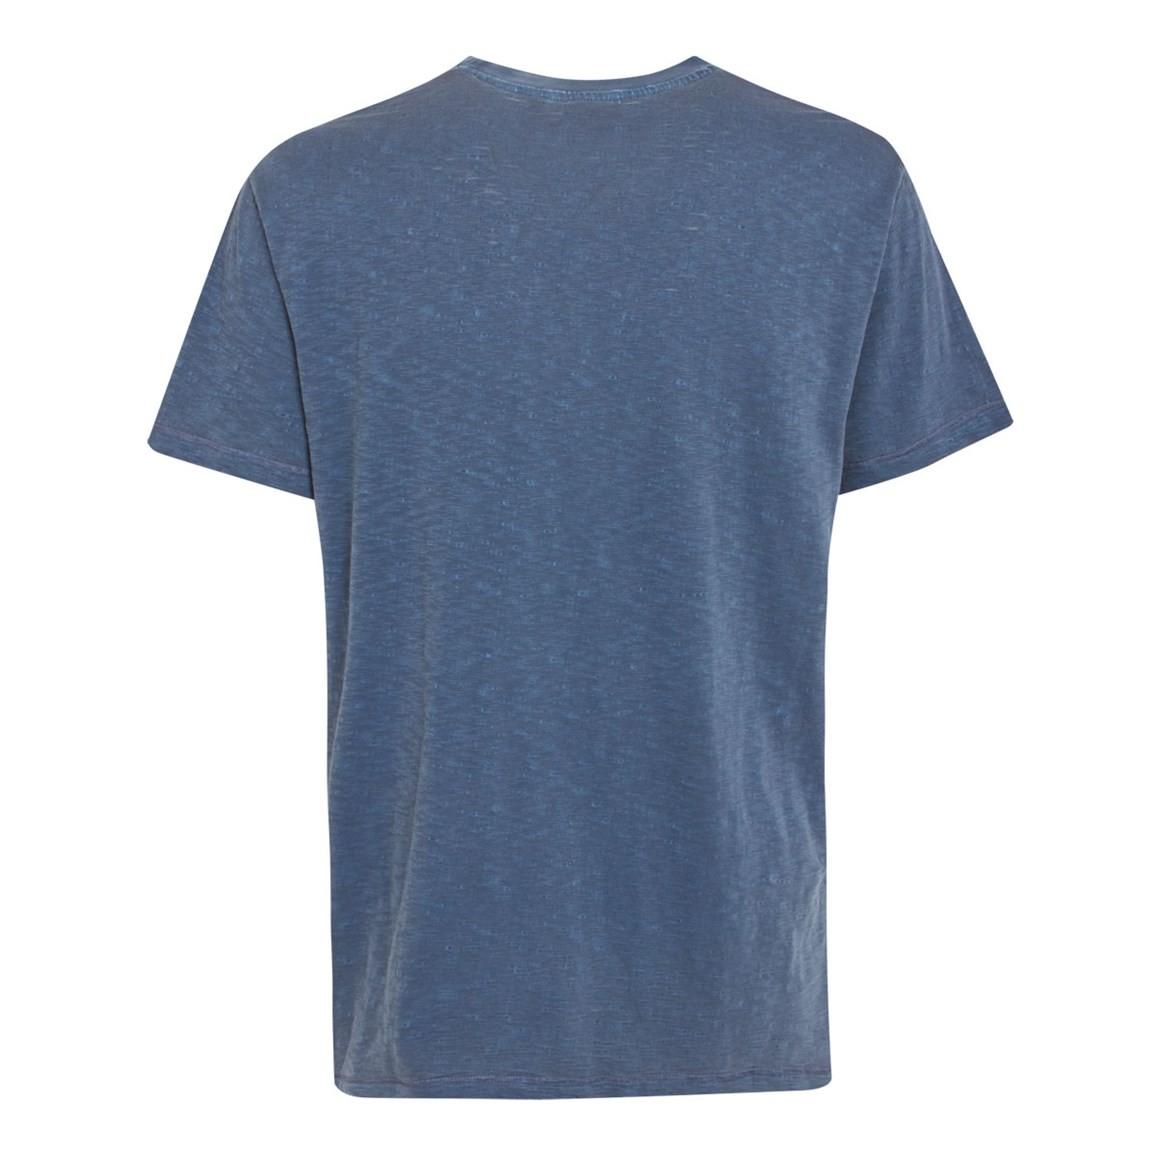 Construction Graphic Print T Shirt Cadet Blue